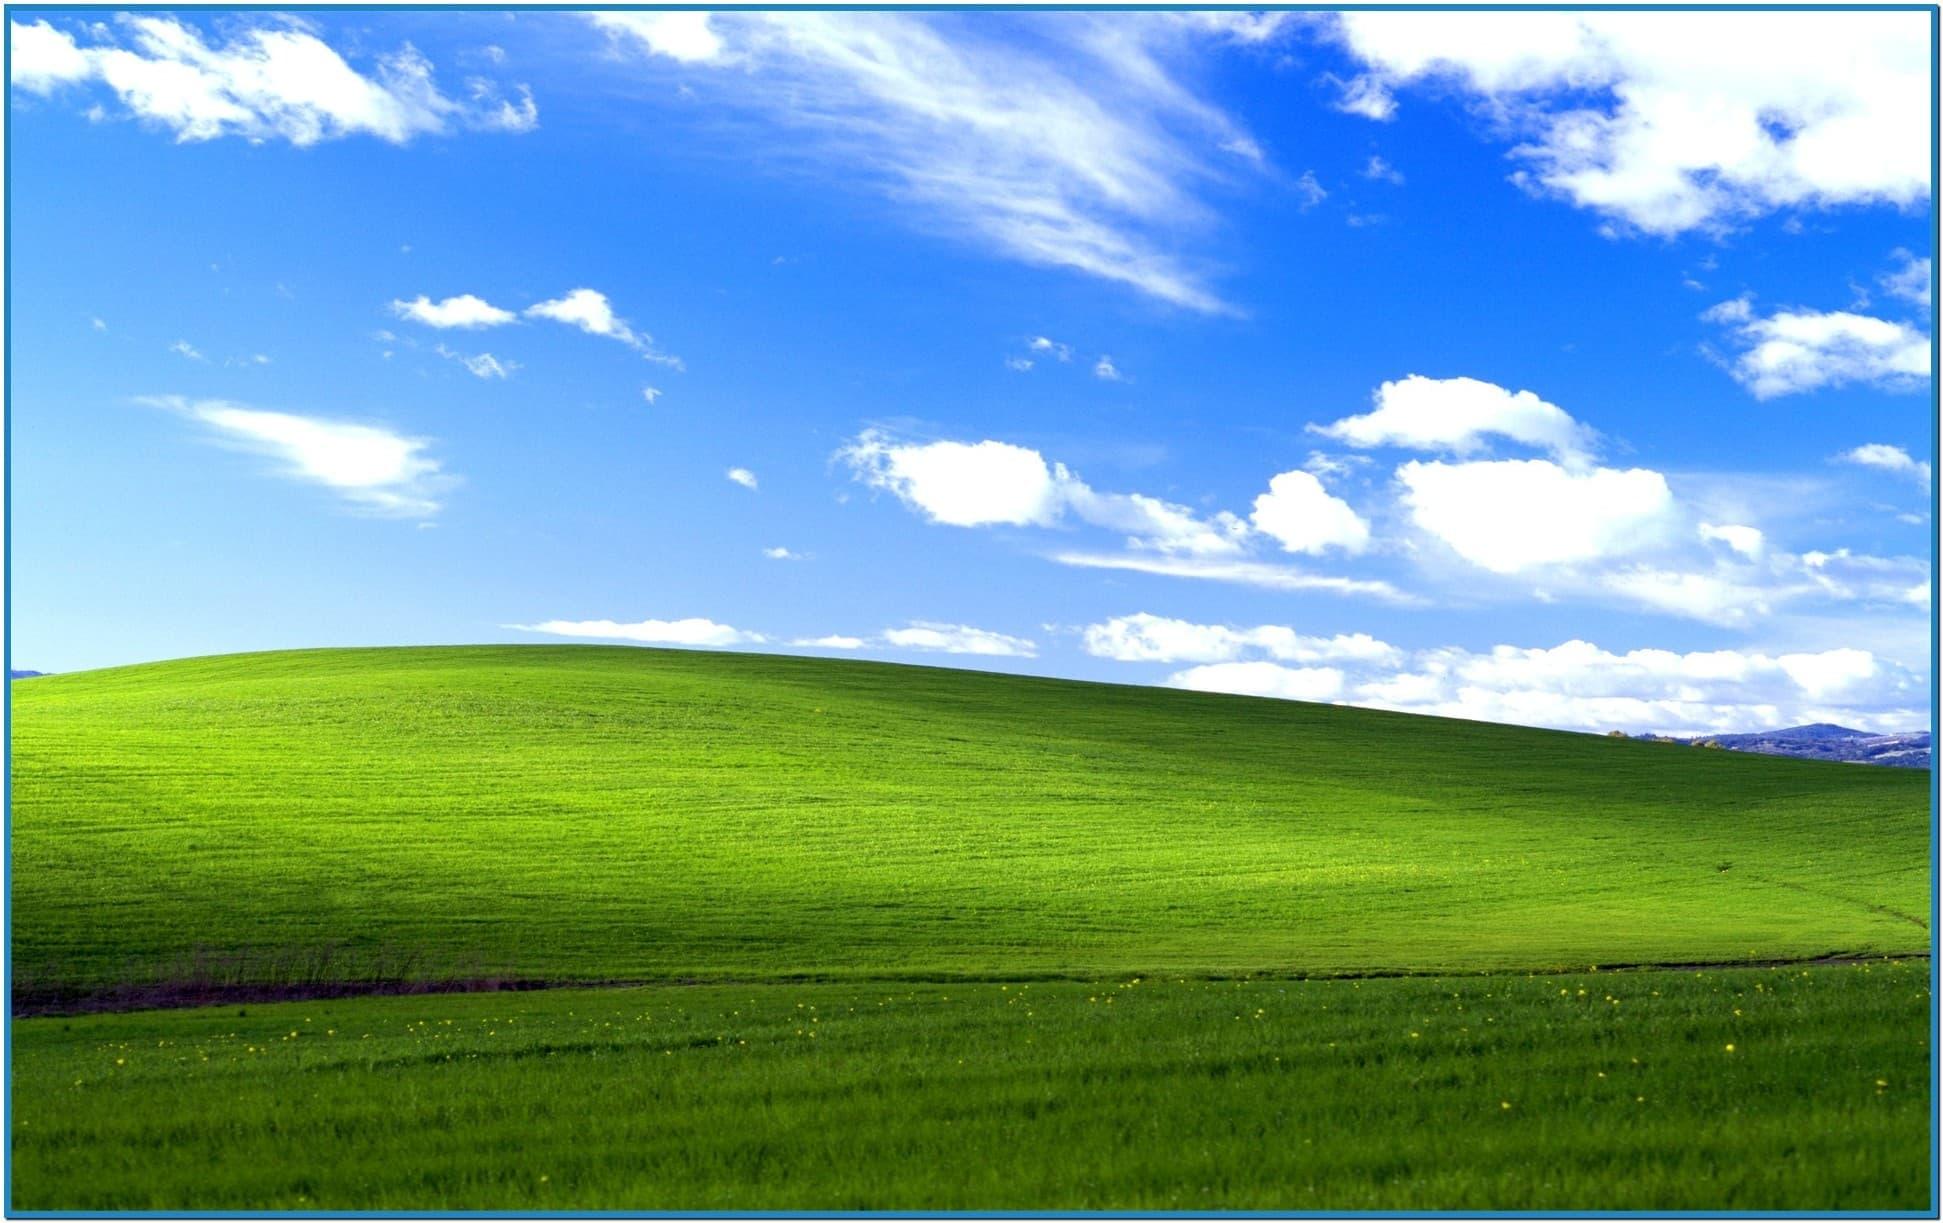 Screensaver as desktop background windows xp   Download 1943x1223